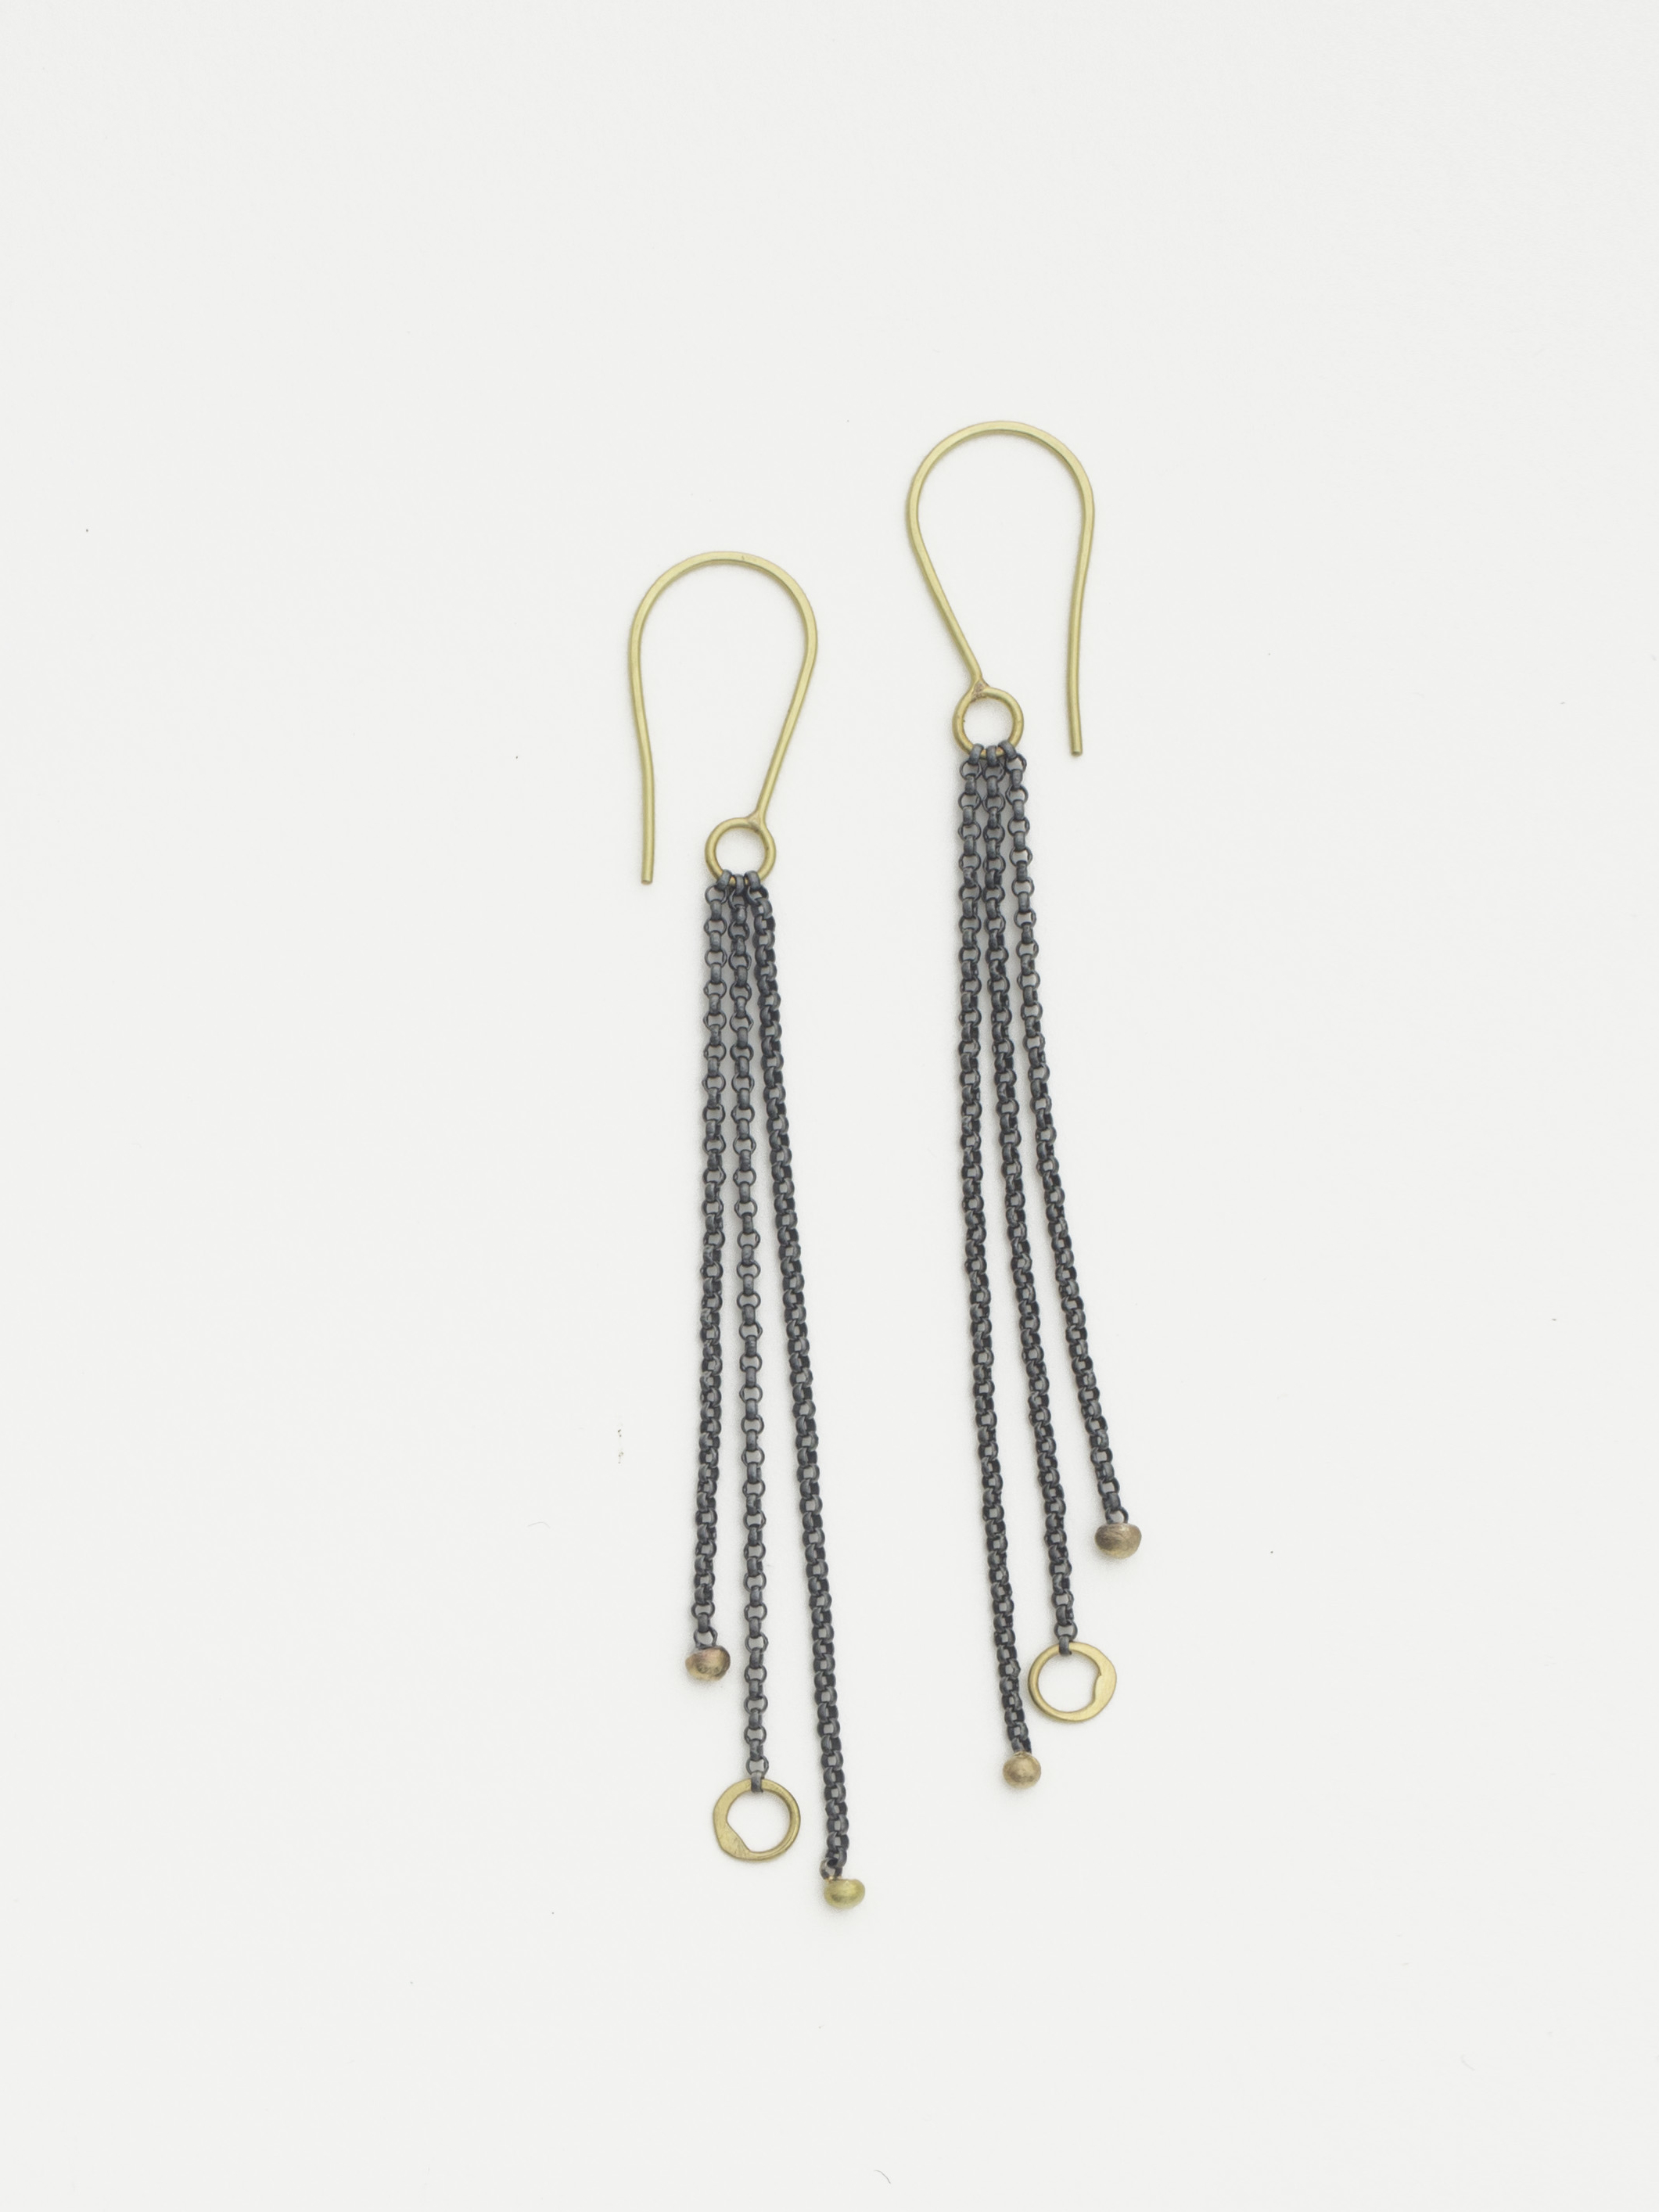 oxi chain earrings.jpg